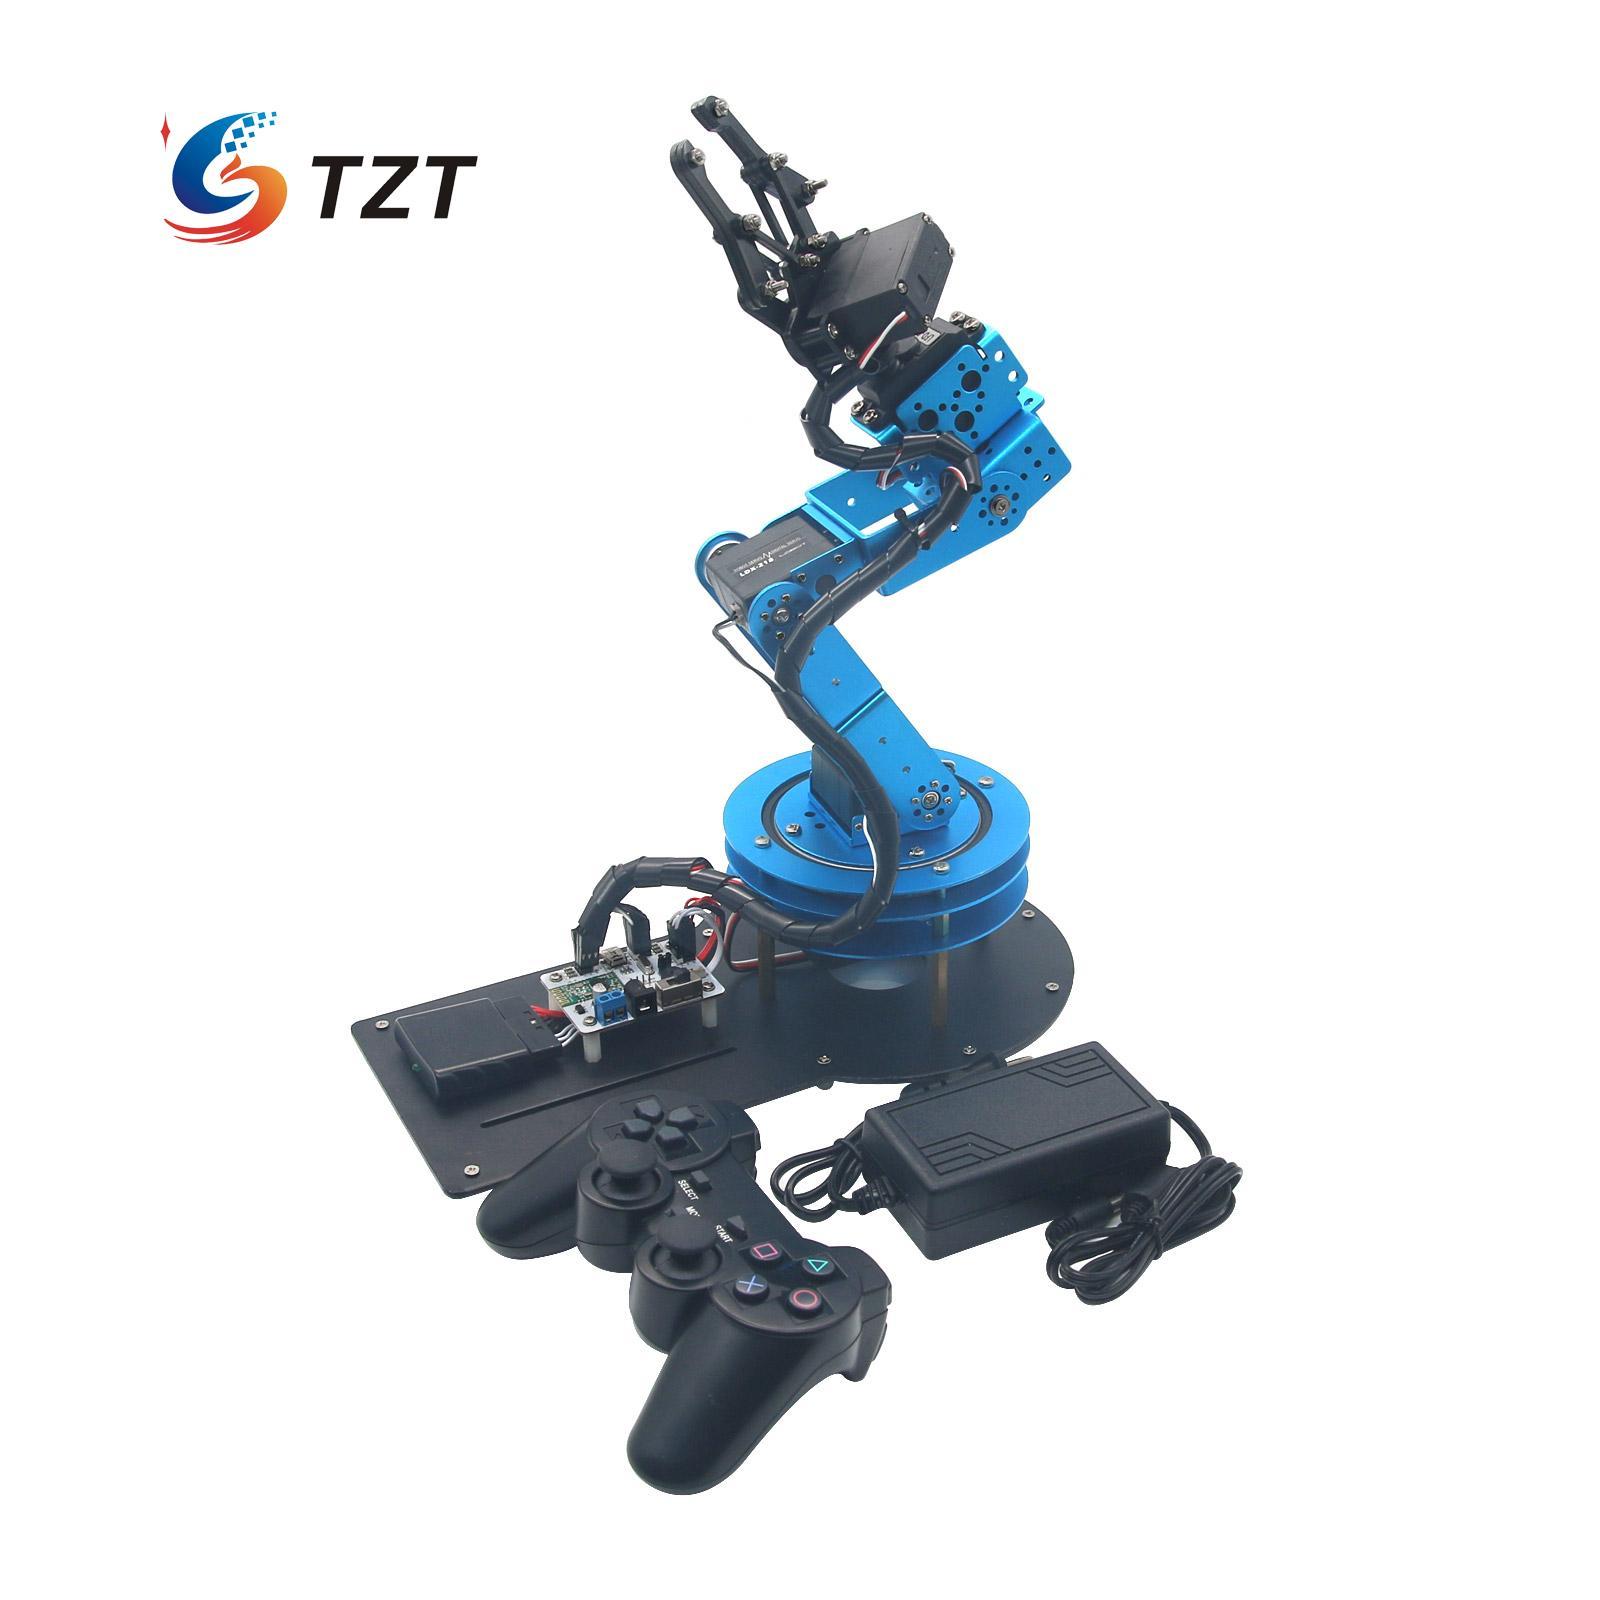 Lewan Soul Arm Robot With 6PCS Digital Servo and Handle Control LeArm Unassembled 6DOF Mechnical Robotic Arm